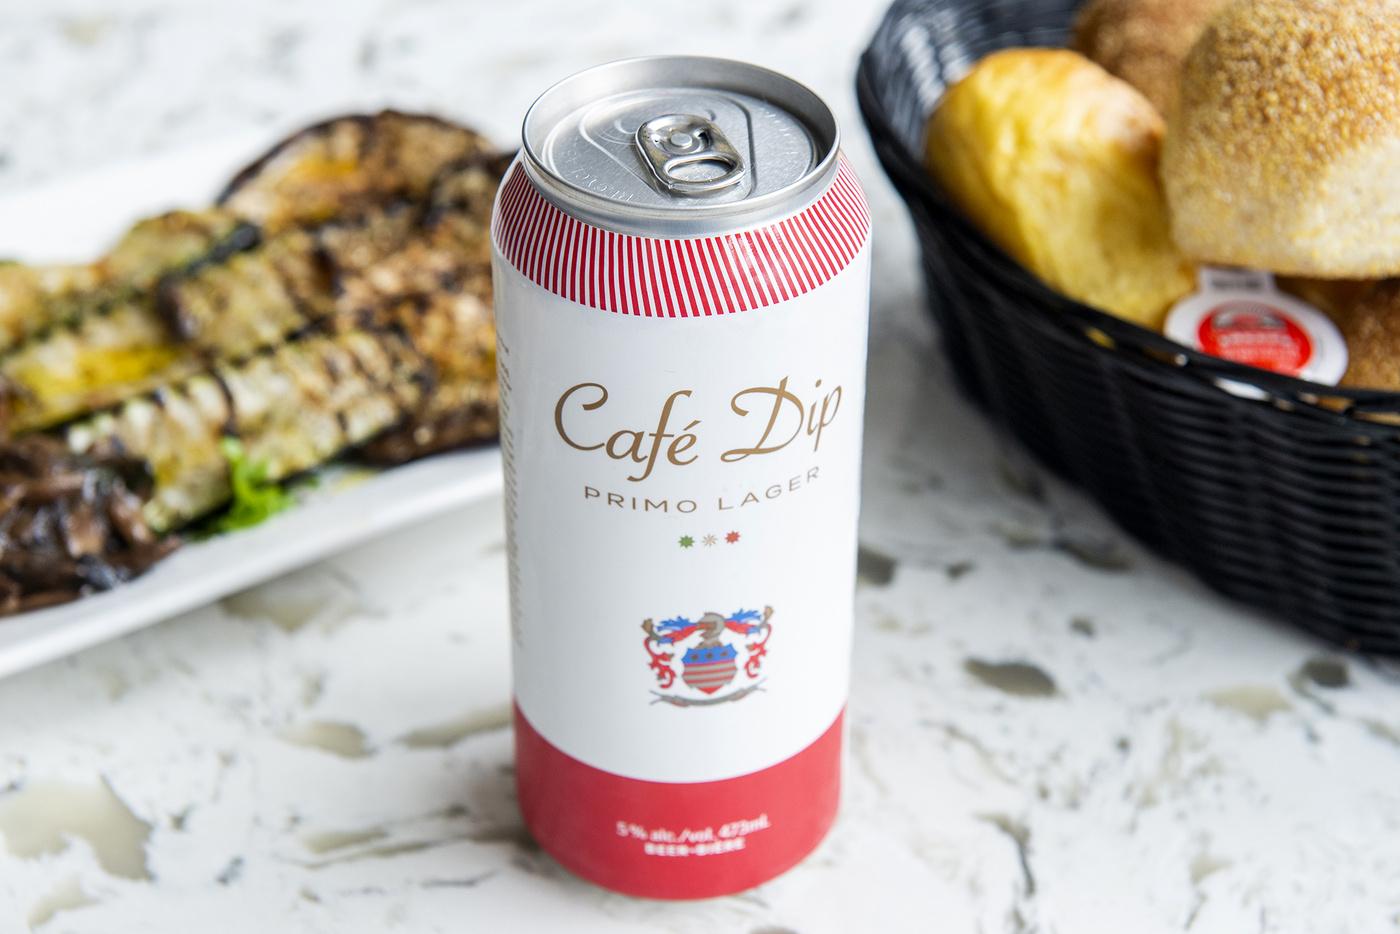 Cafe Diplomatico Toronto